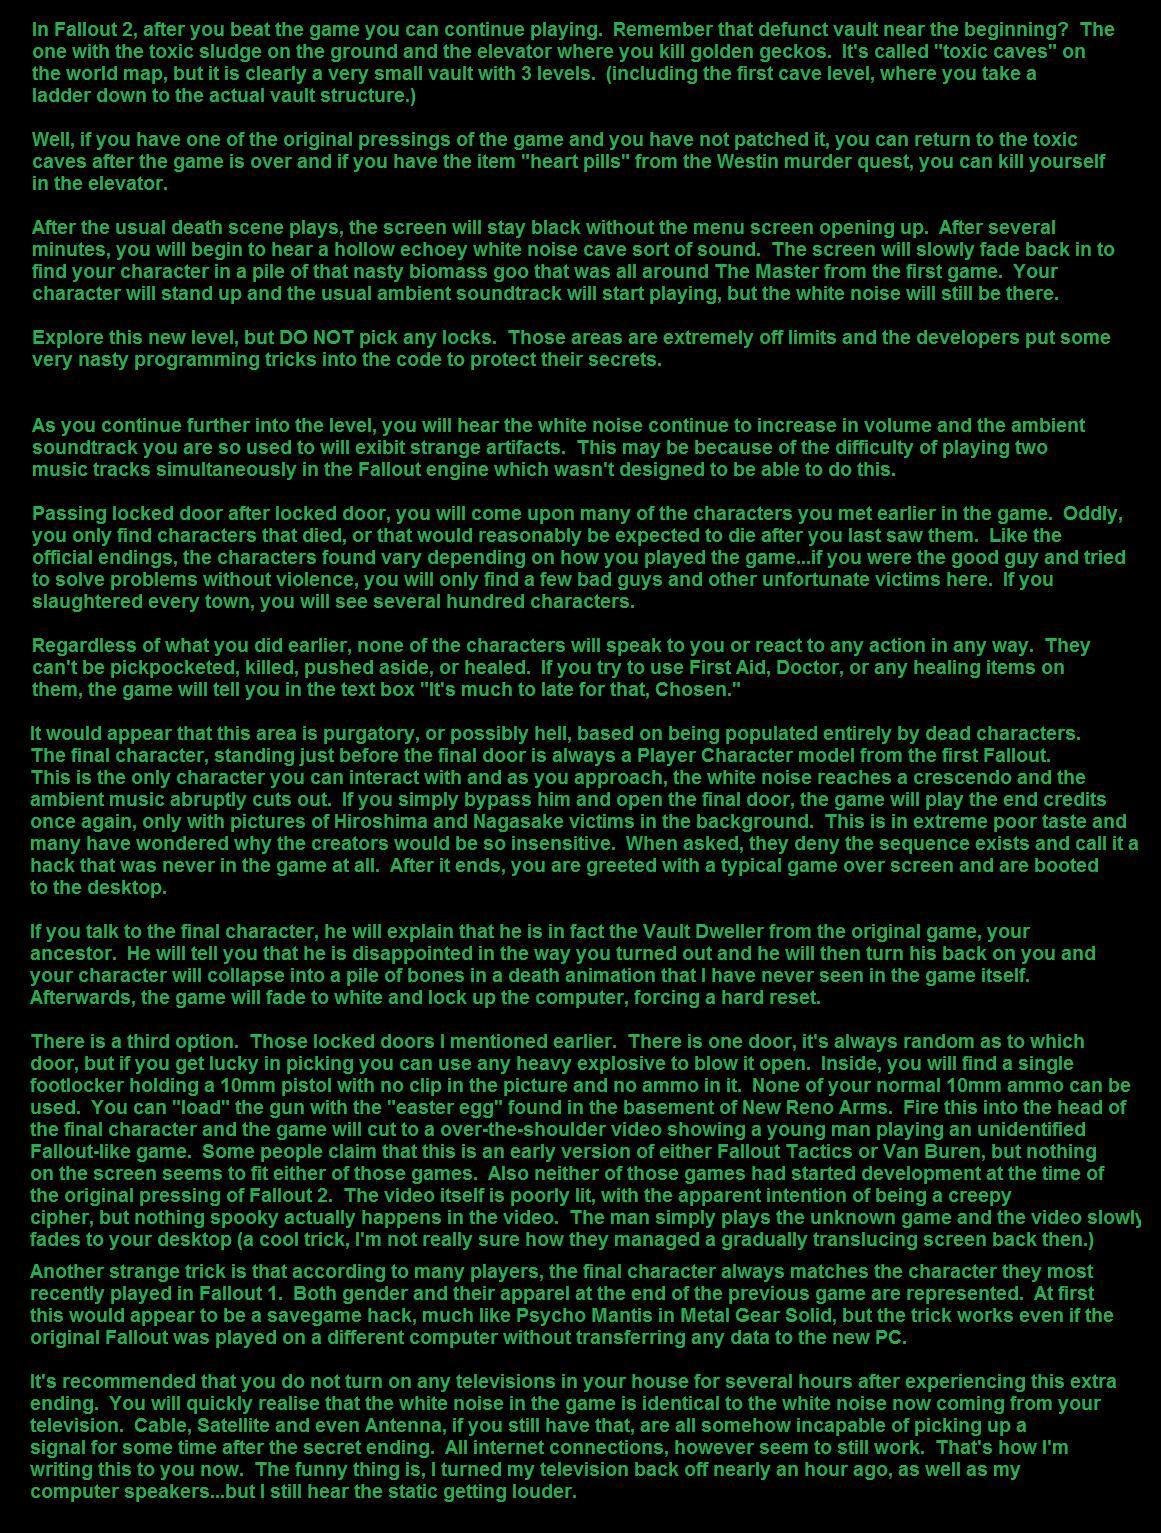 Image - Fallout 2 Ending Horror.jpg | Creepypasta Wiki | FANDOM ...